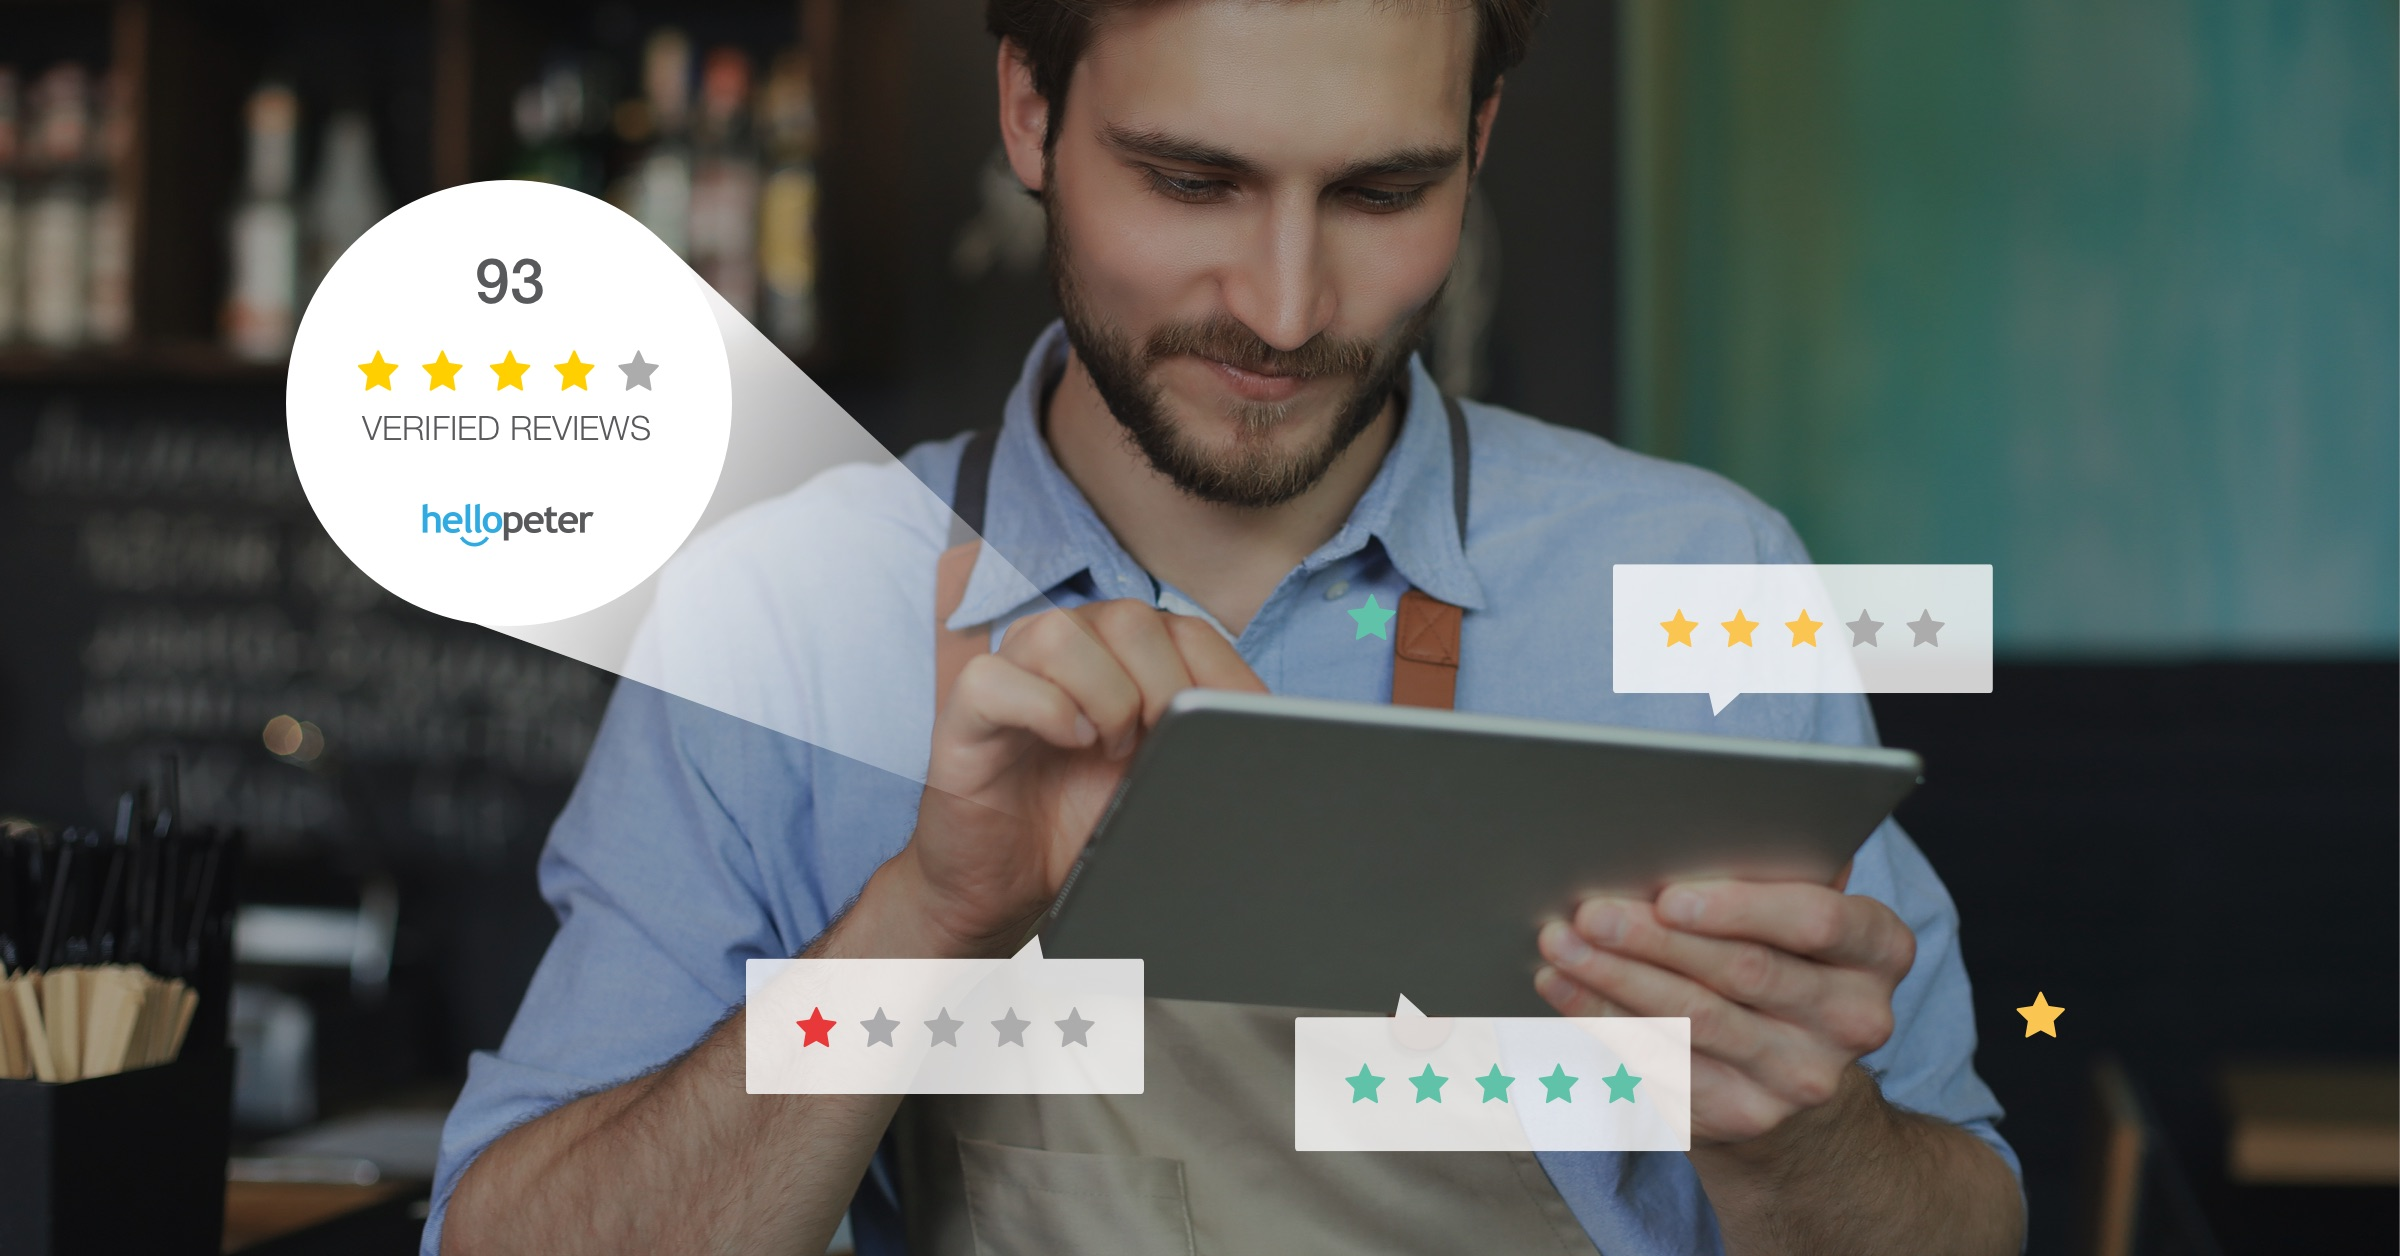 93-verified-reviews